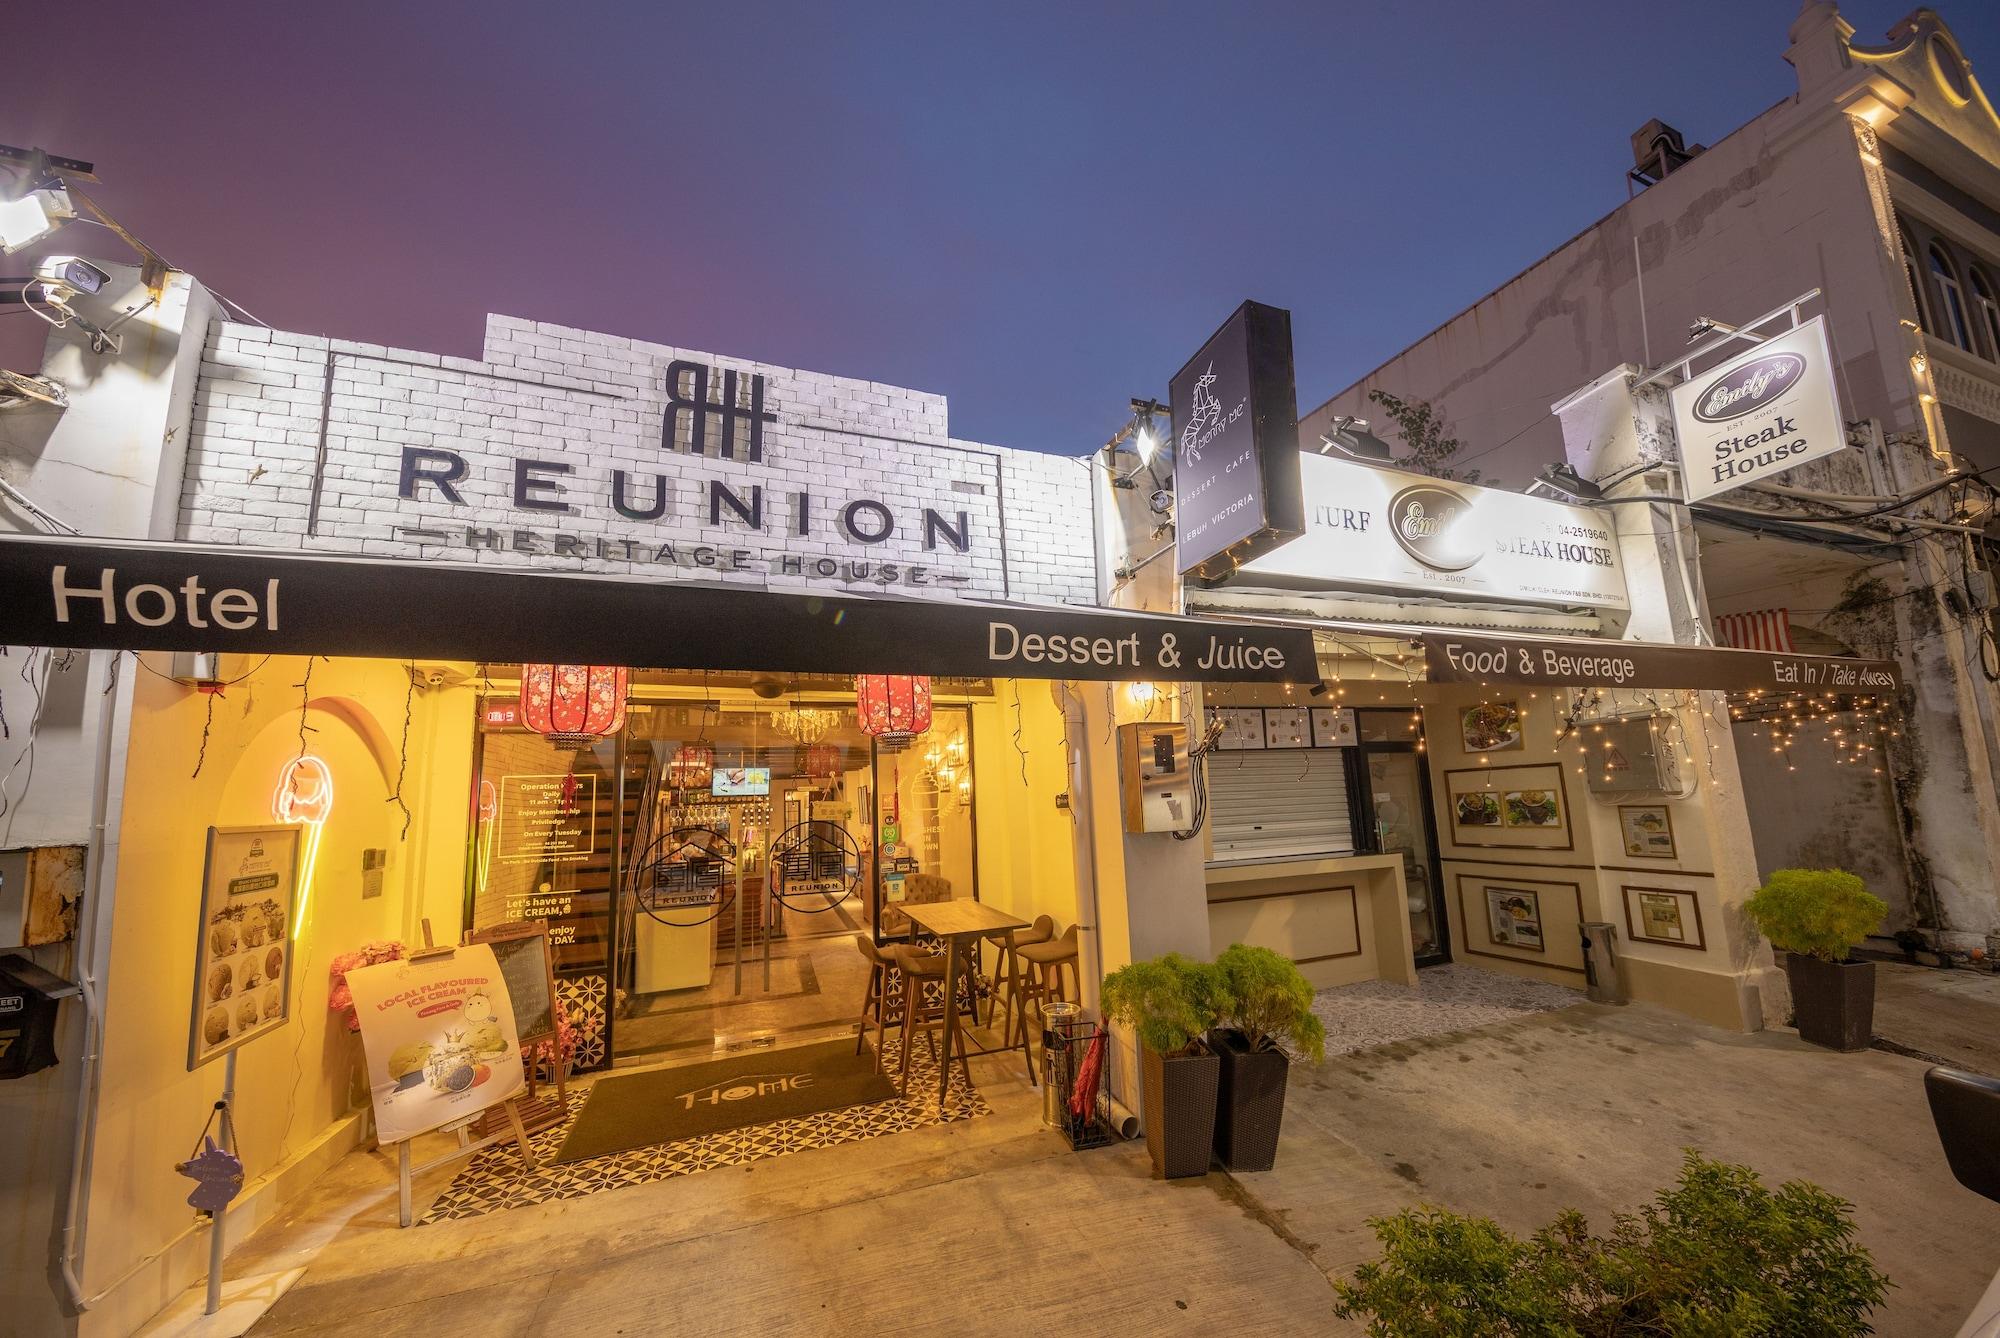 Reunion Heritage House, Pulau Penang